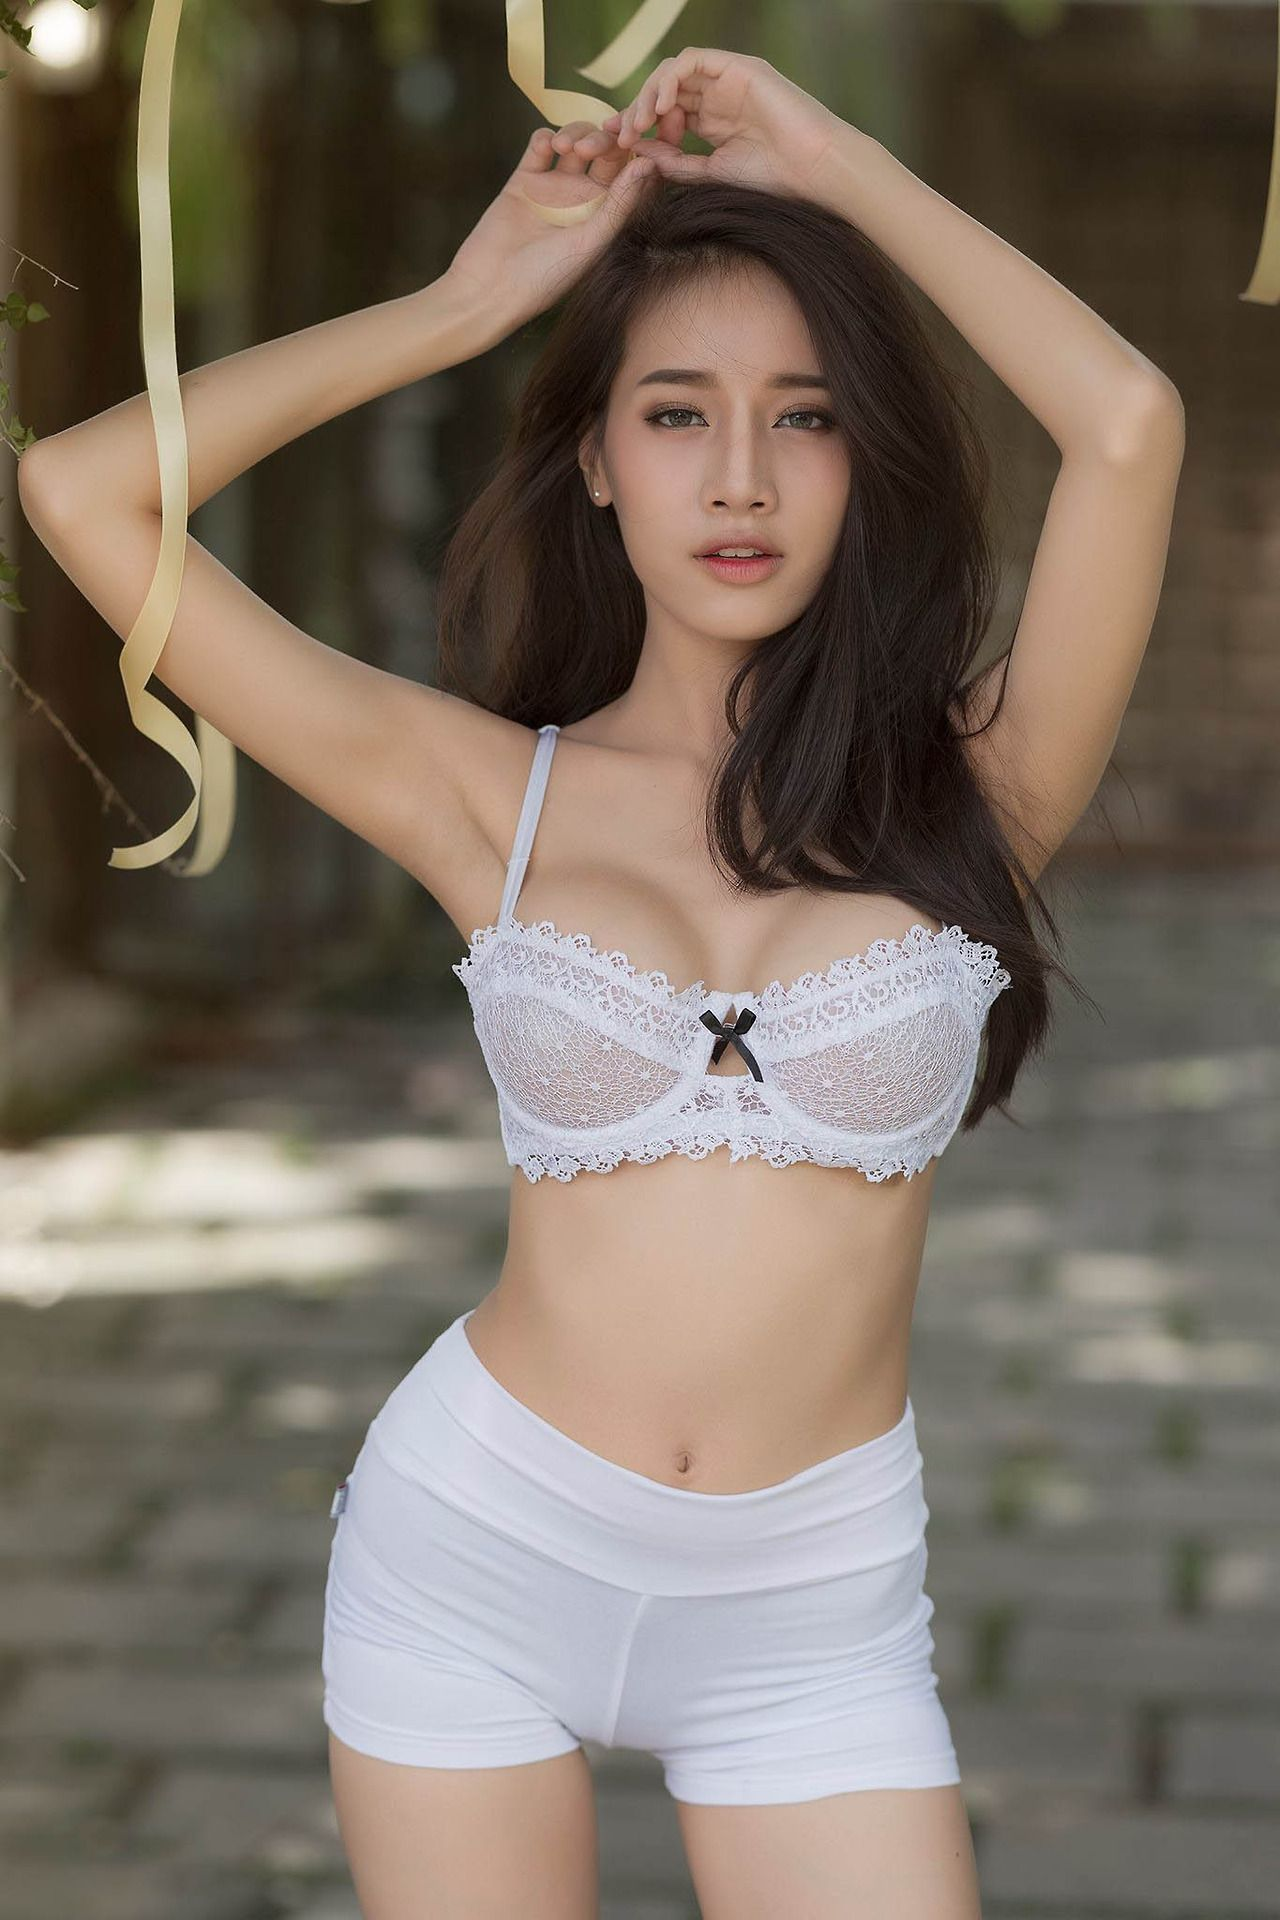 Sexy Asian Girls Photo